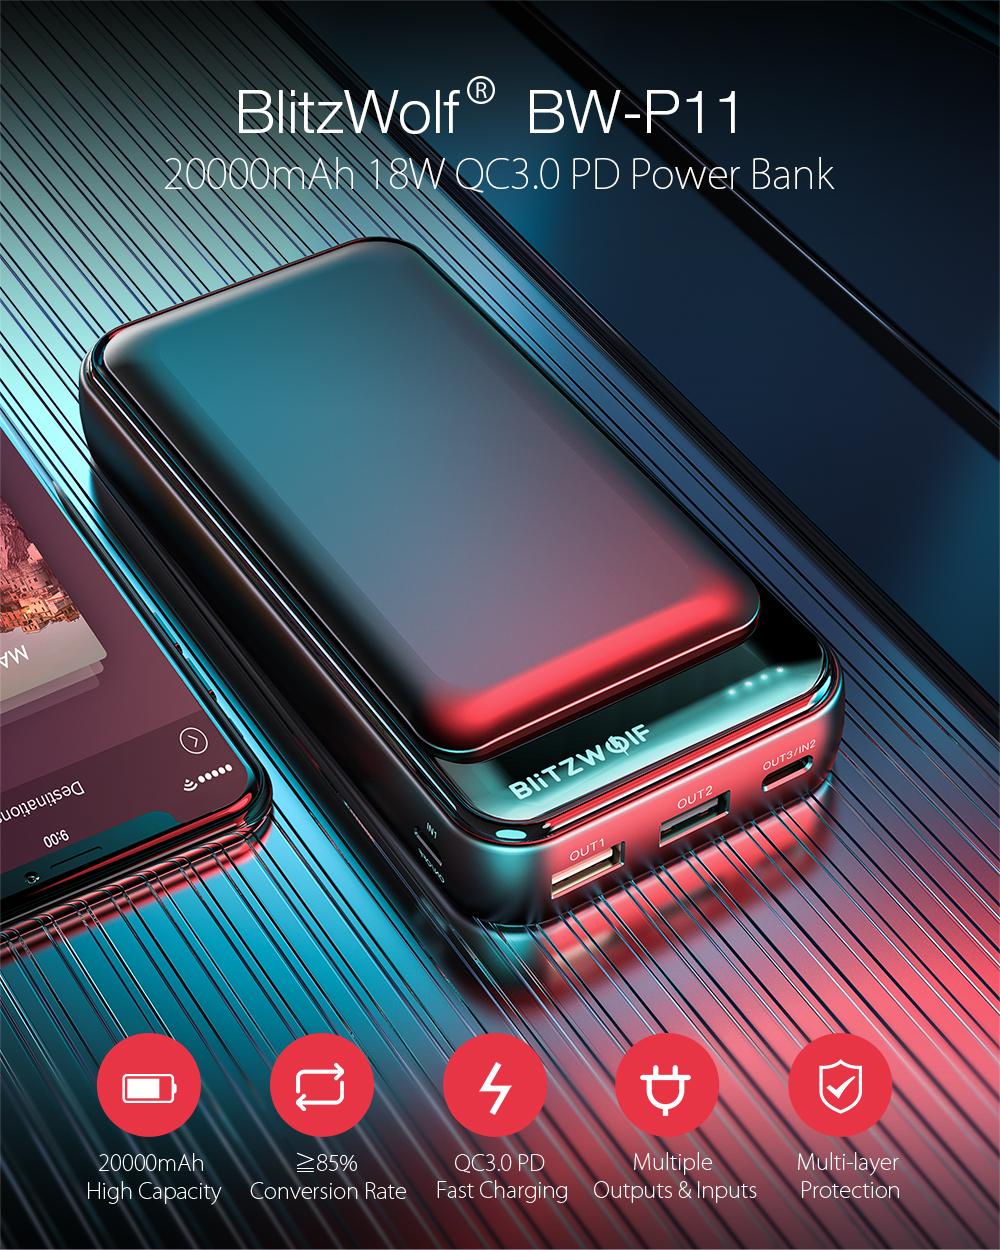 Blitzwolf BW-P11 power bank 20000mAh